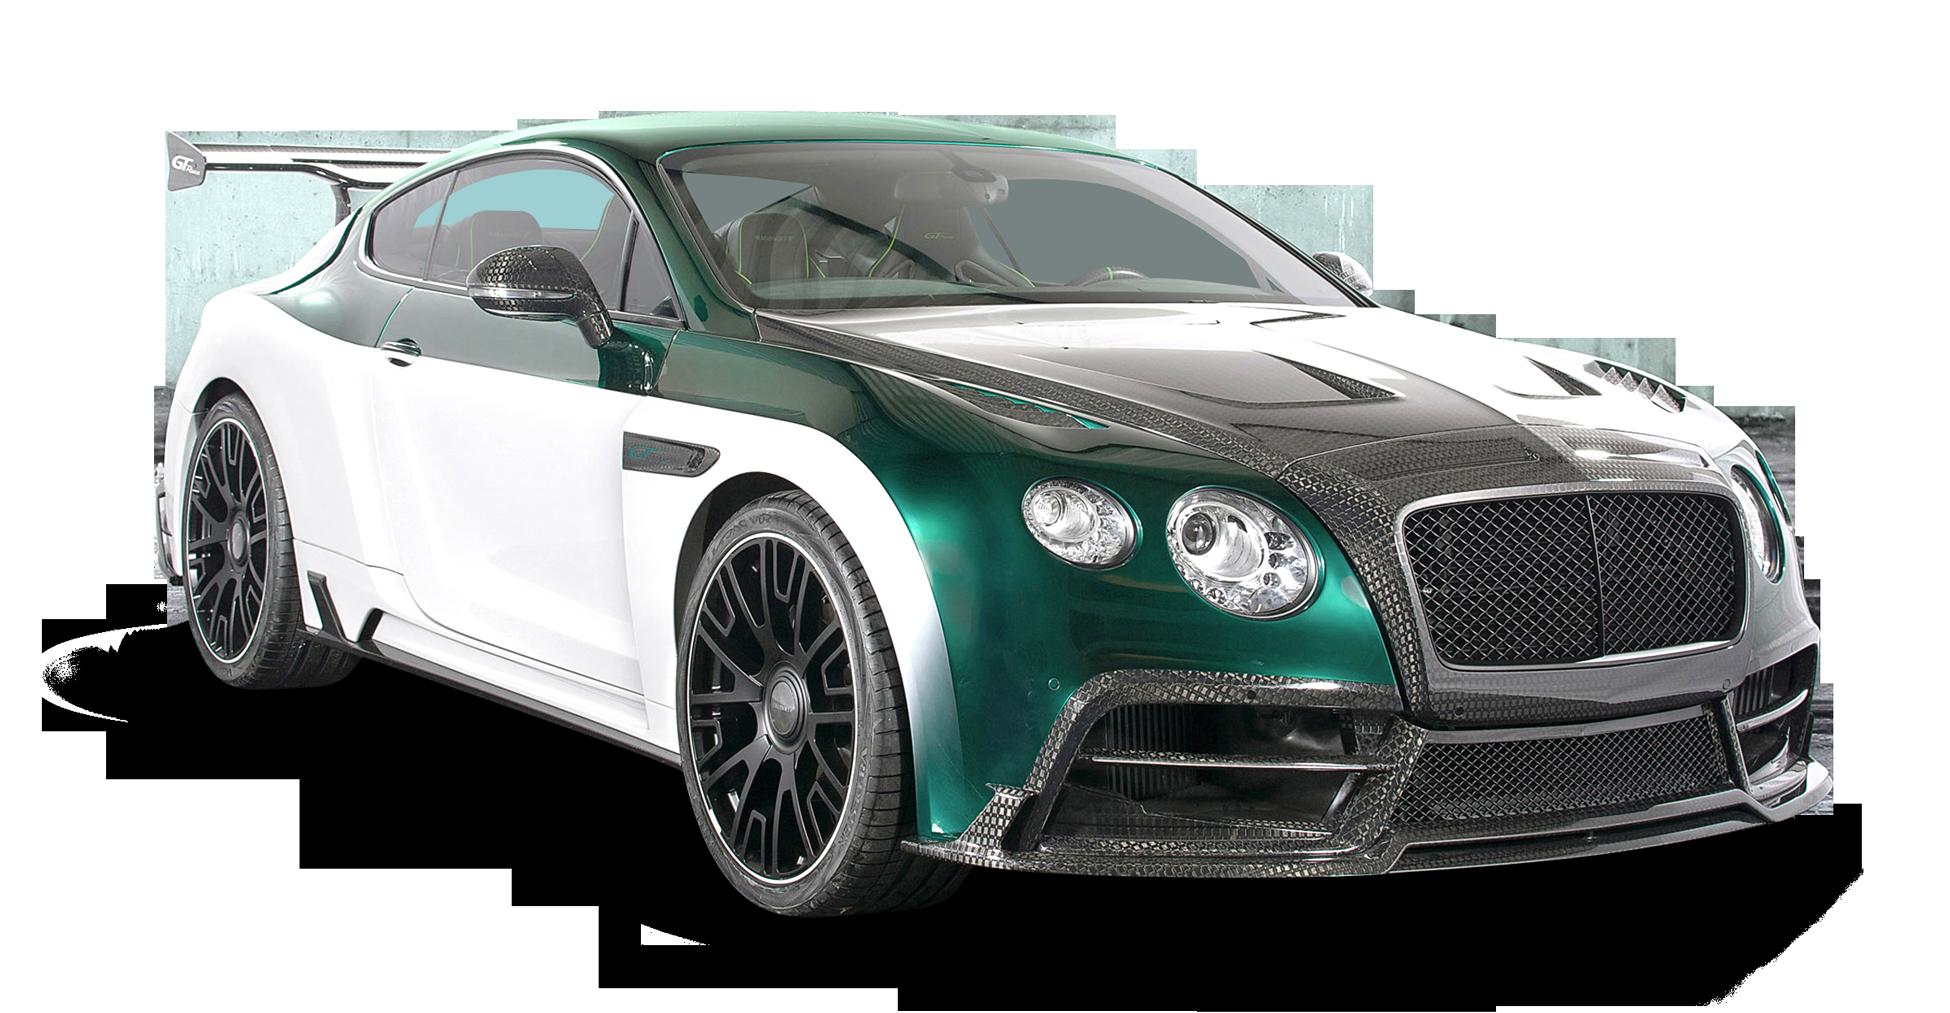 Green Bentley Continental GT Car